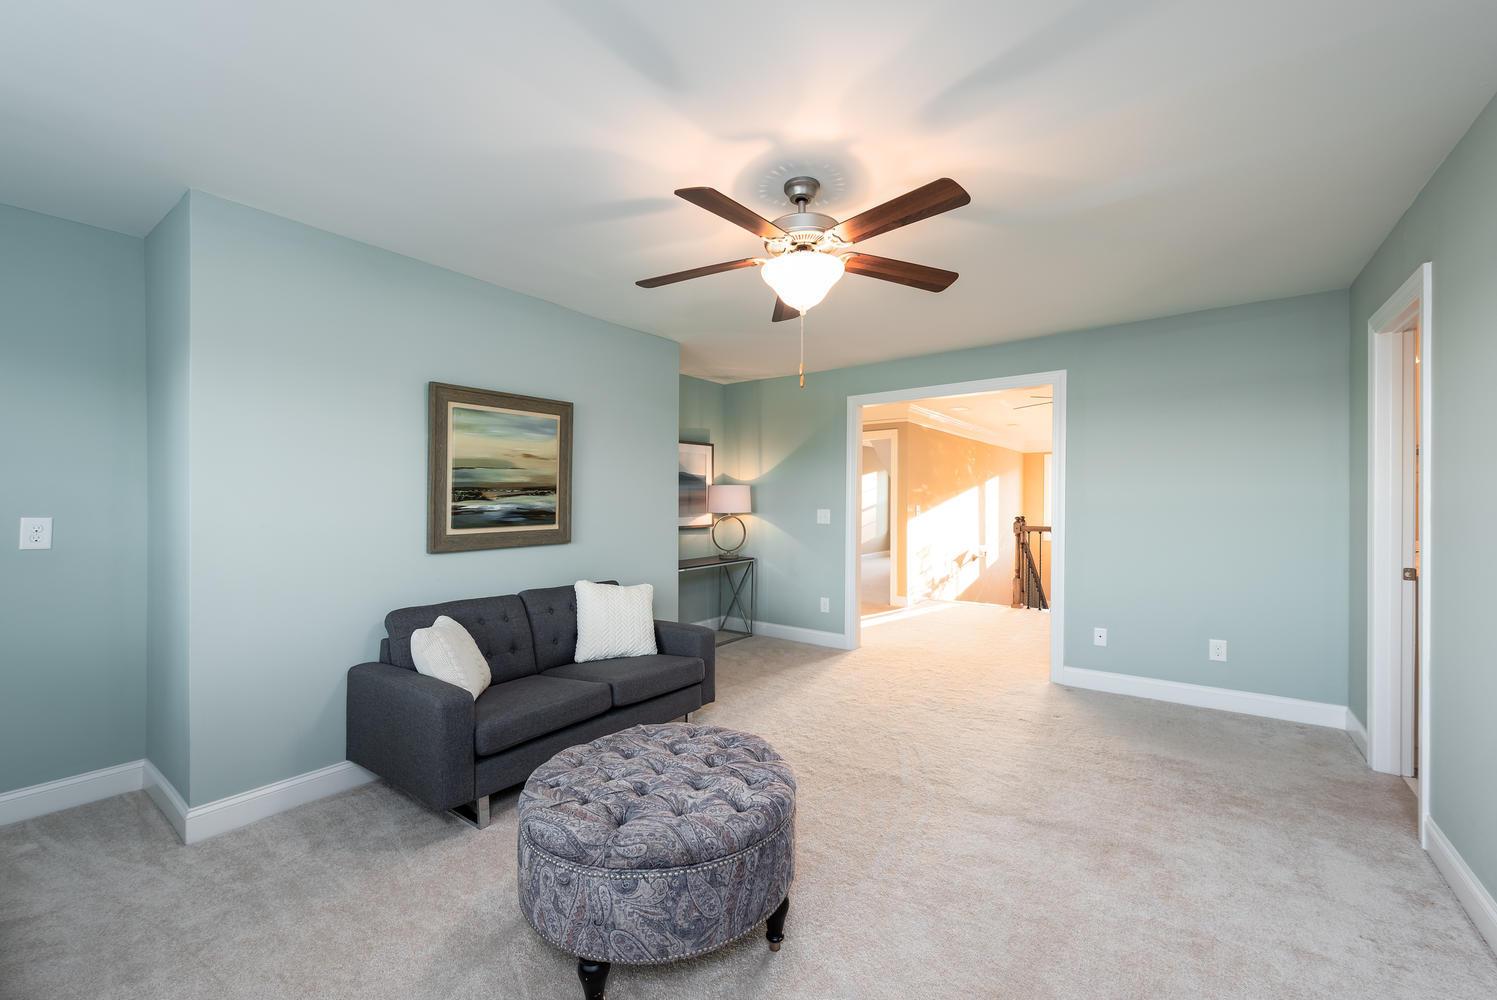 River Reach Pointe Homes For Sale - 1216 Rivers Reach Drive, Charleston, SC - 2